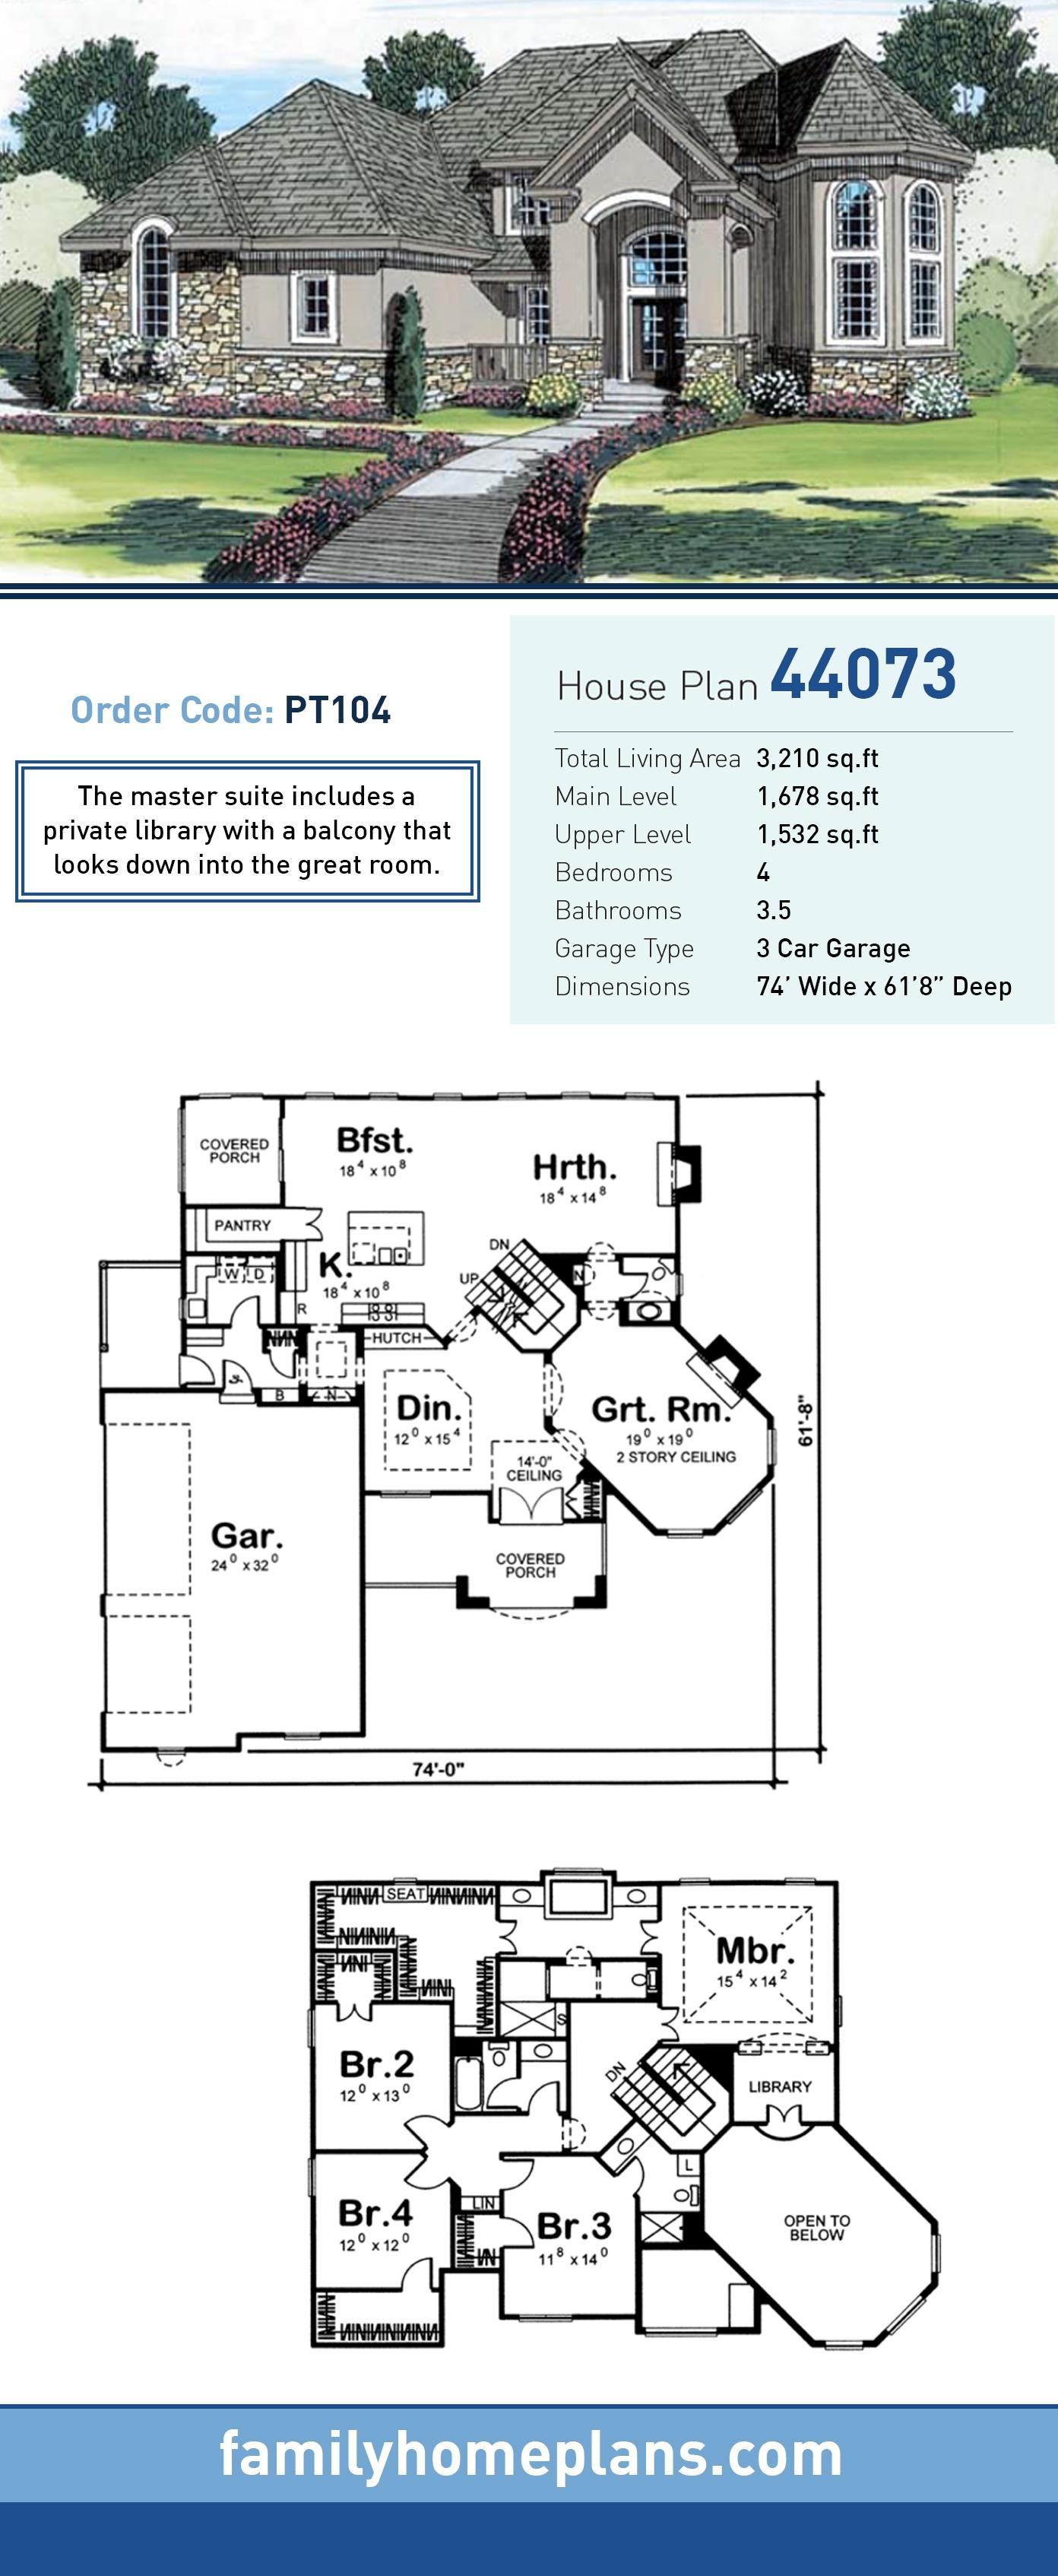 European House Plan 44073 with 4 Beds, 4 Baths, 3 Car Garage